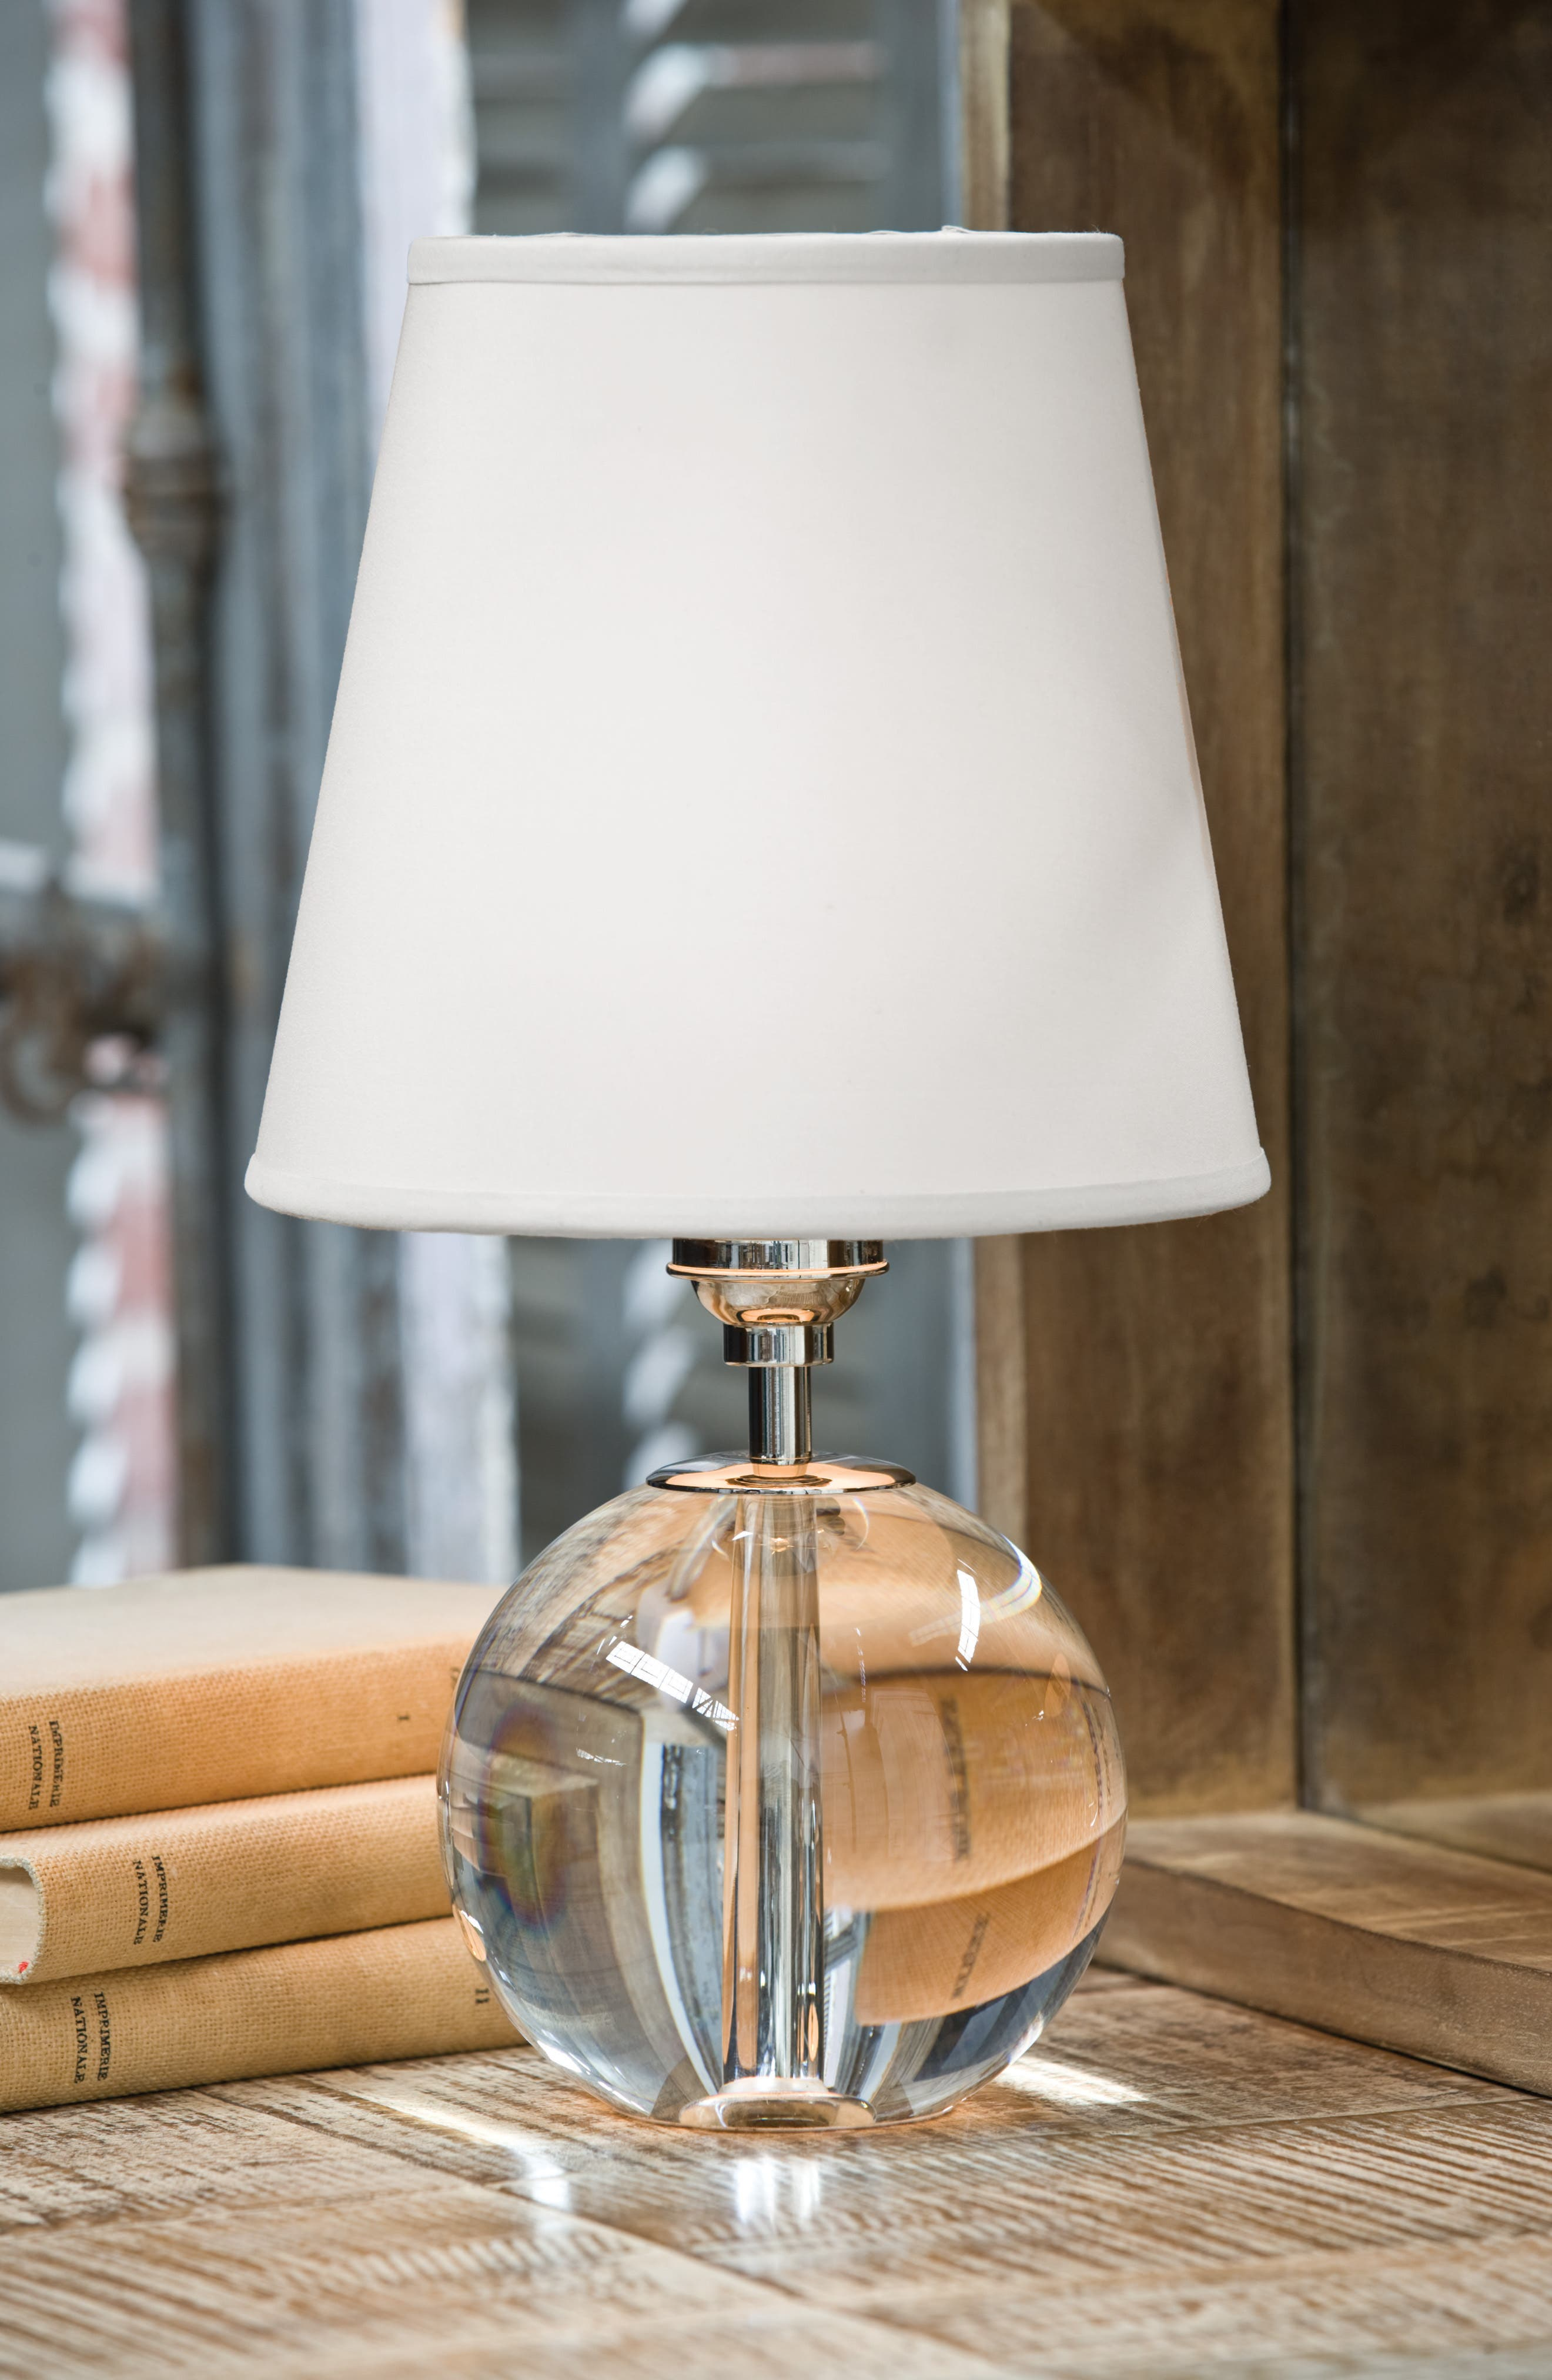 Lighting lamps fans nordstrom jameslax Choice Image